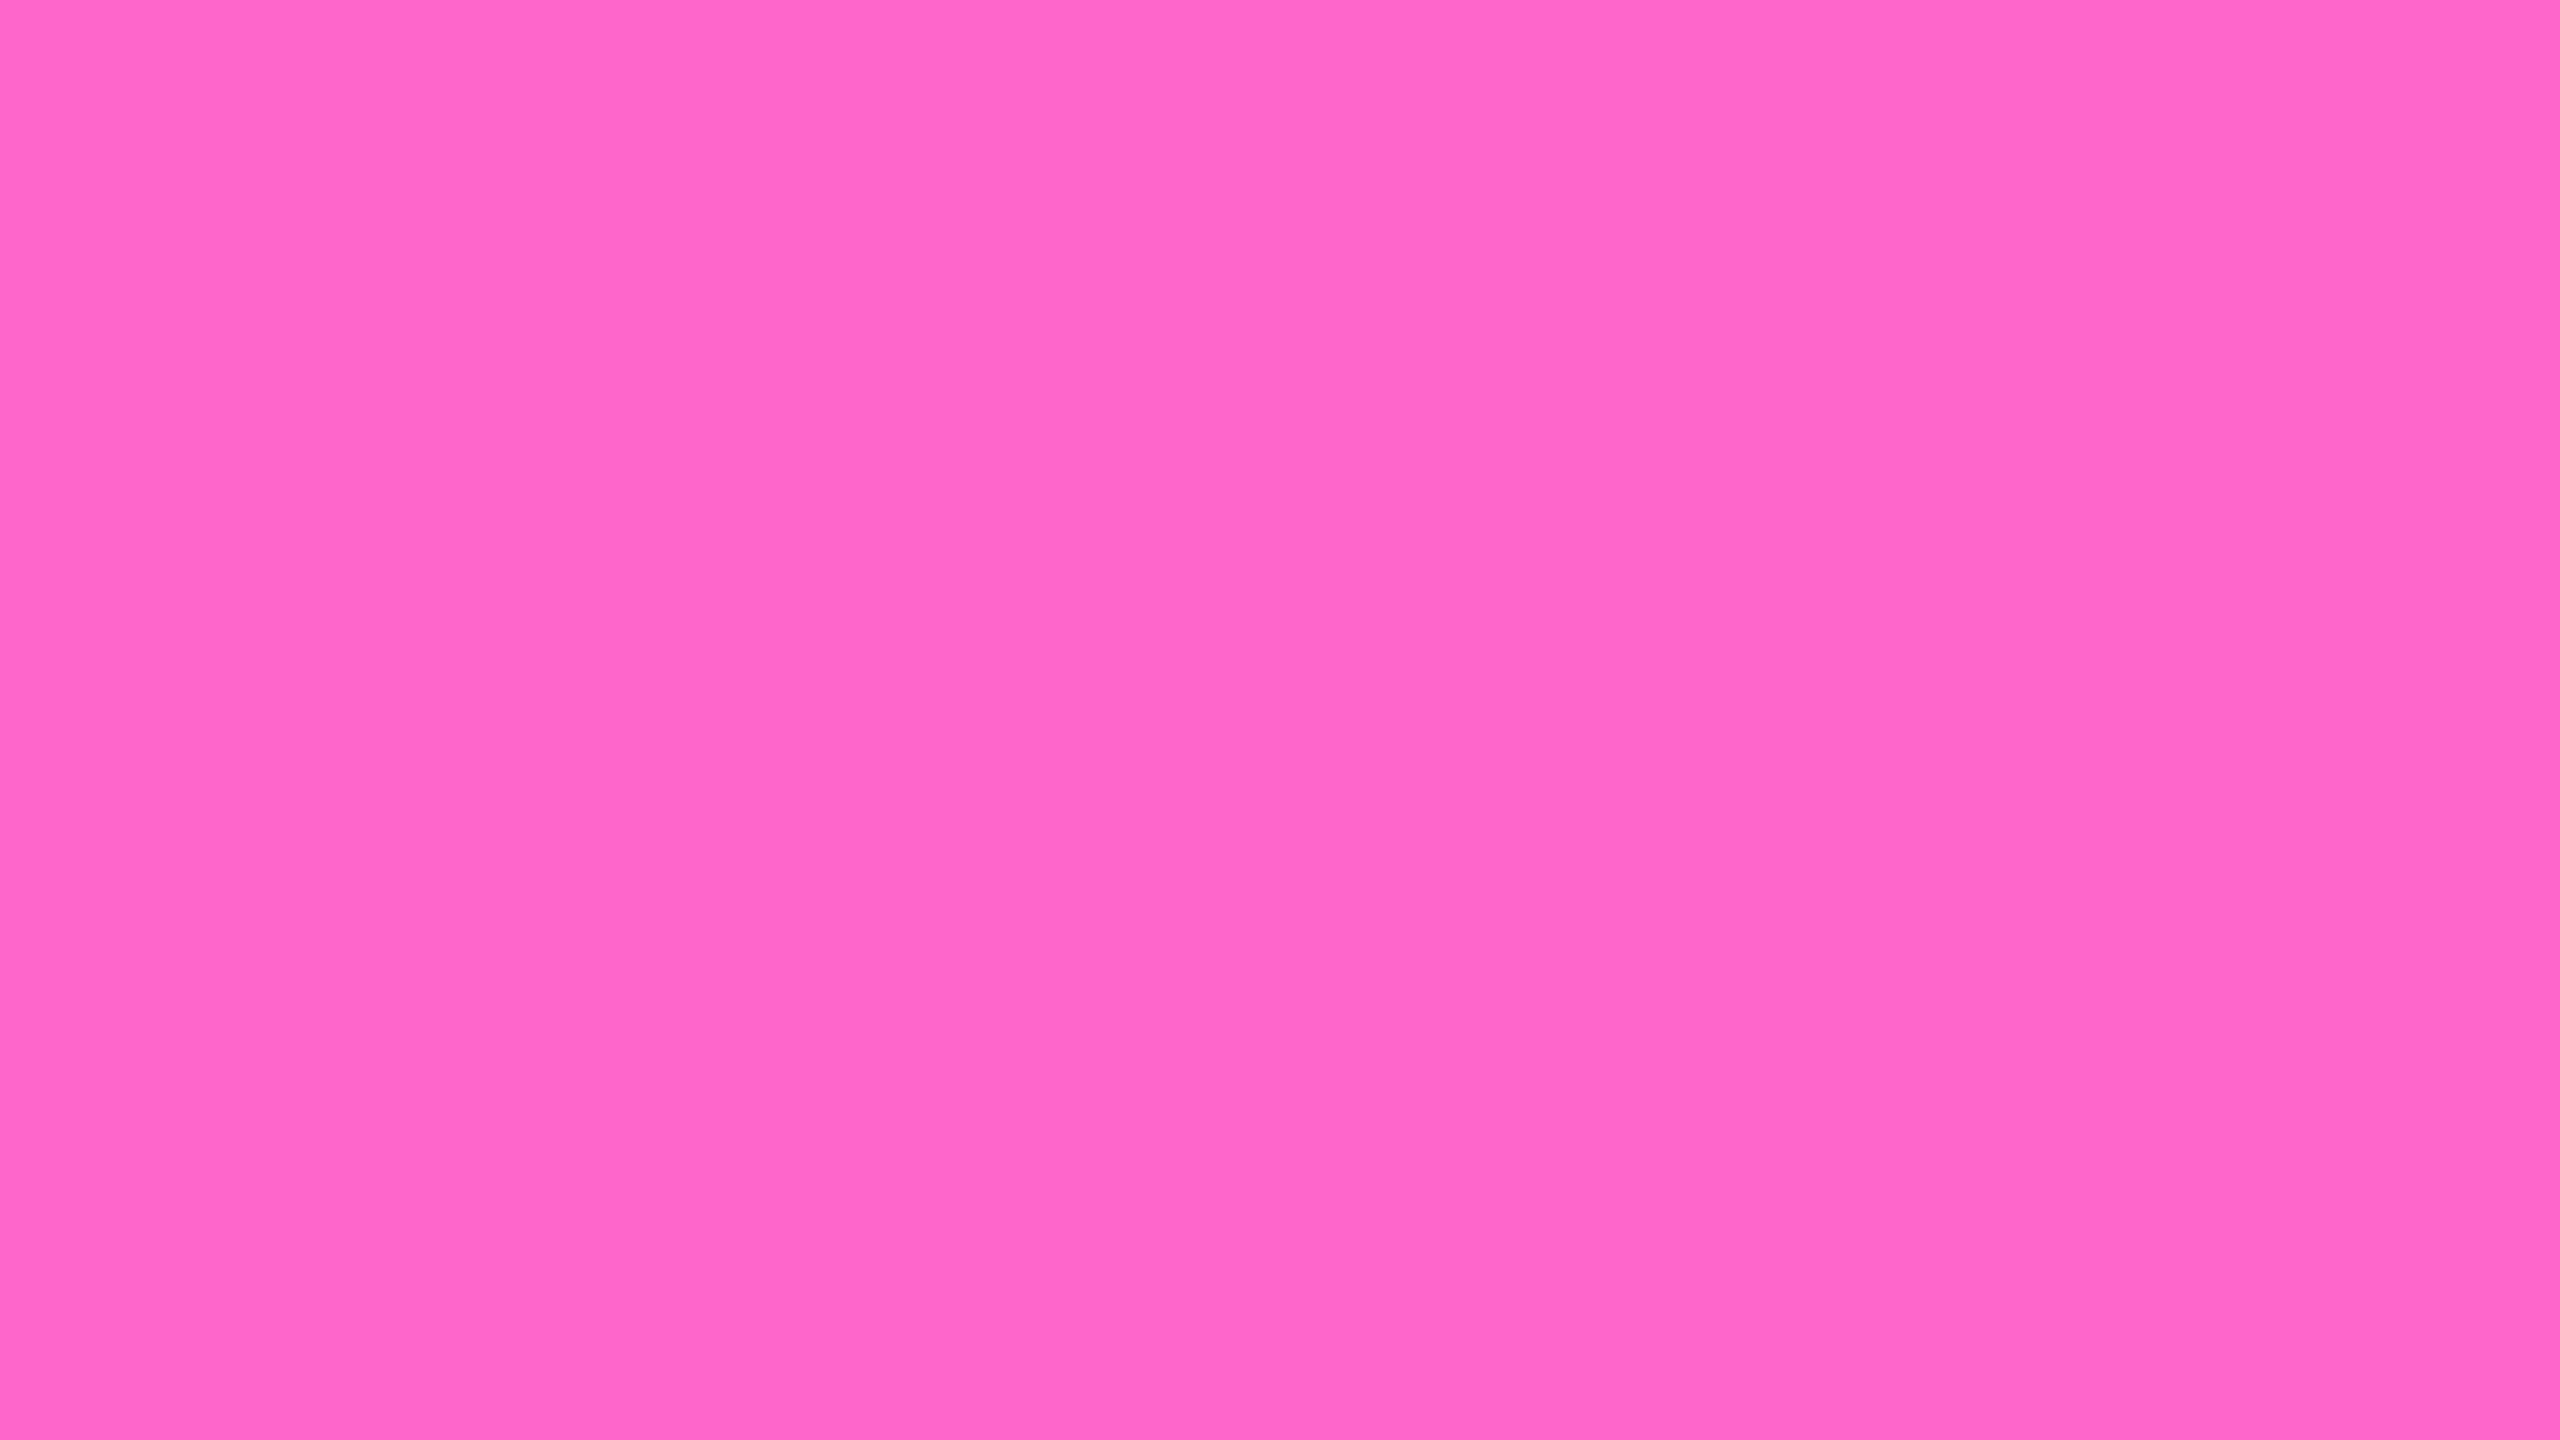 2560x1440 Rose Pink Solid Color Background